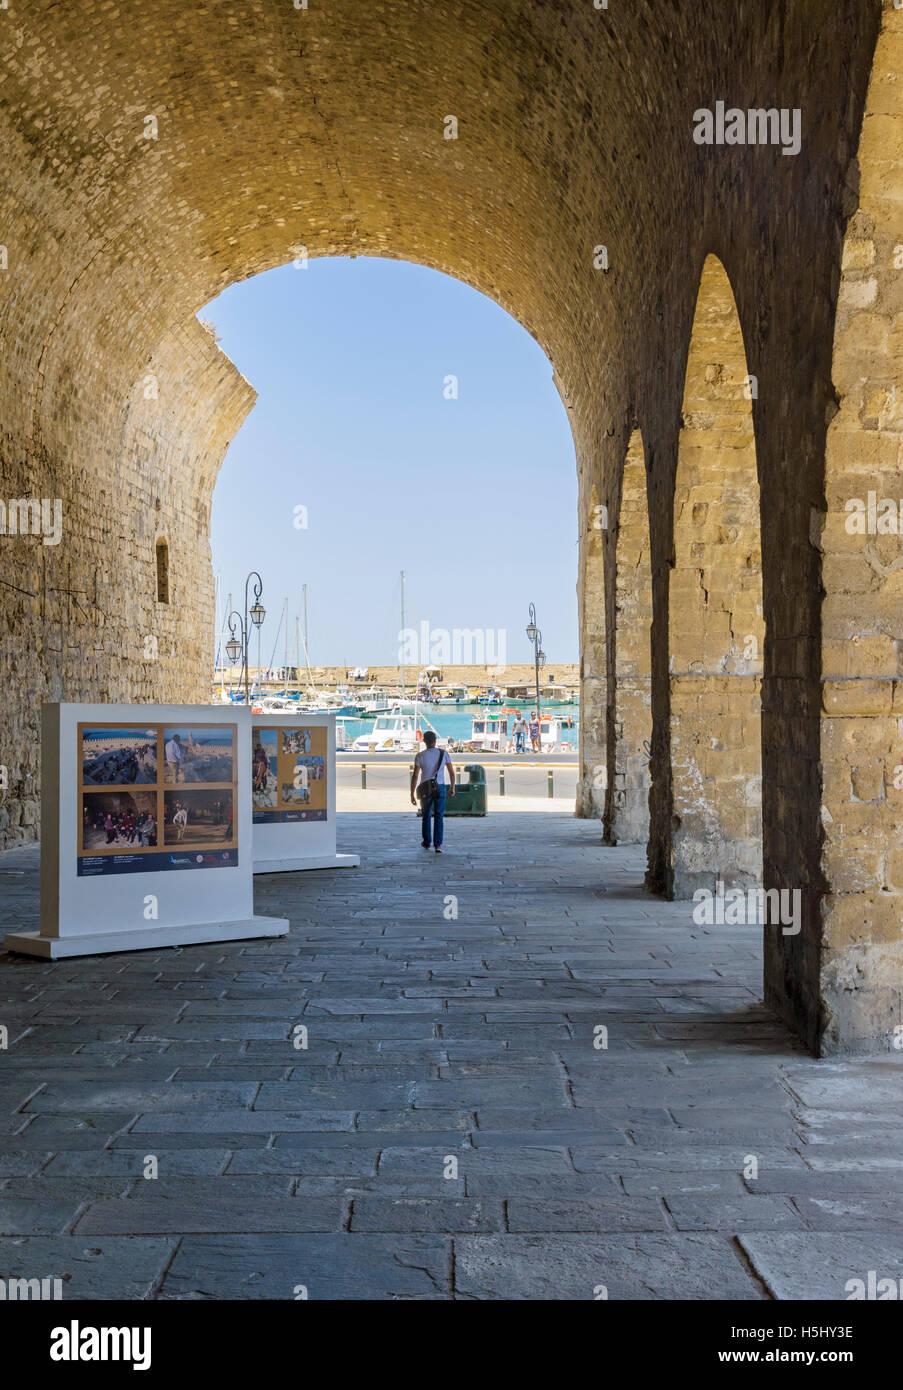 Inside the old Venetian Arsenals, Heraklion, Crete, Greece - Stock Image